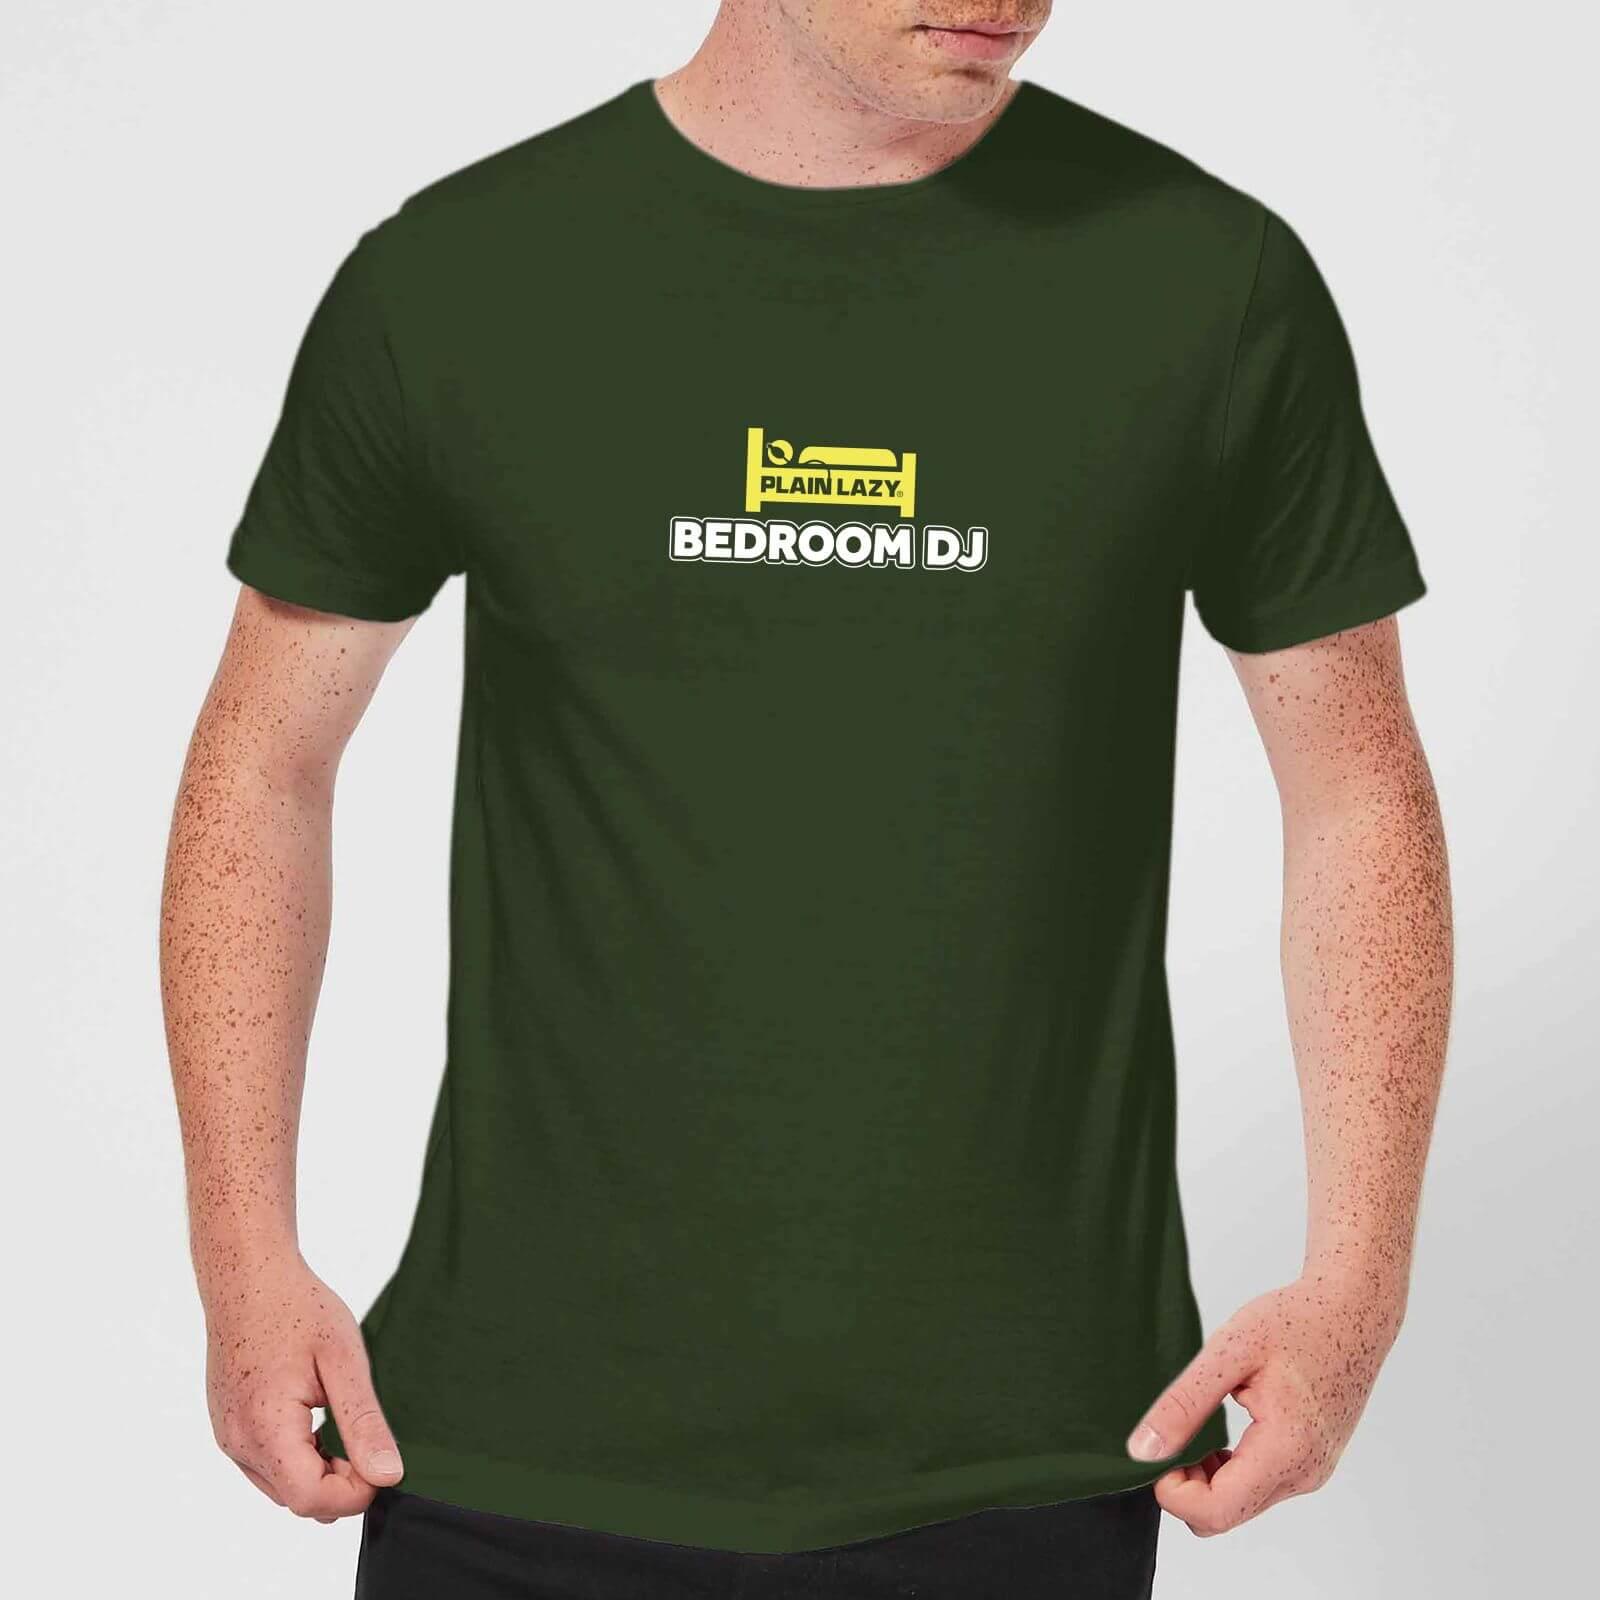 Plain Lazy Bedroom DJ Men's T-Shirt - Forest Green - XS - Forest Green